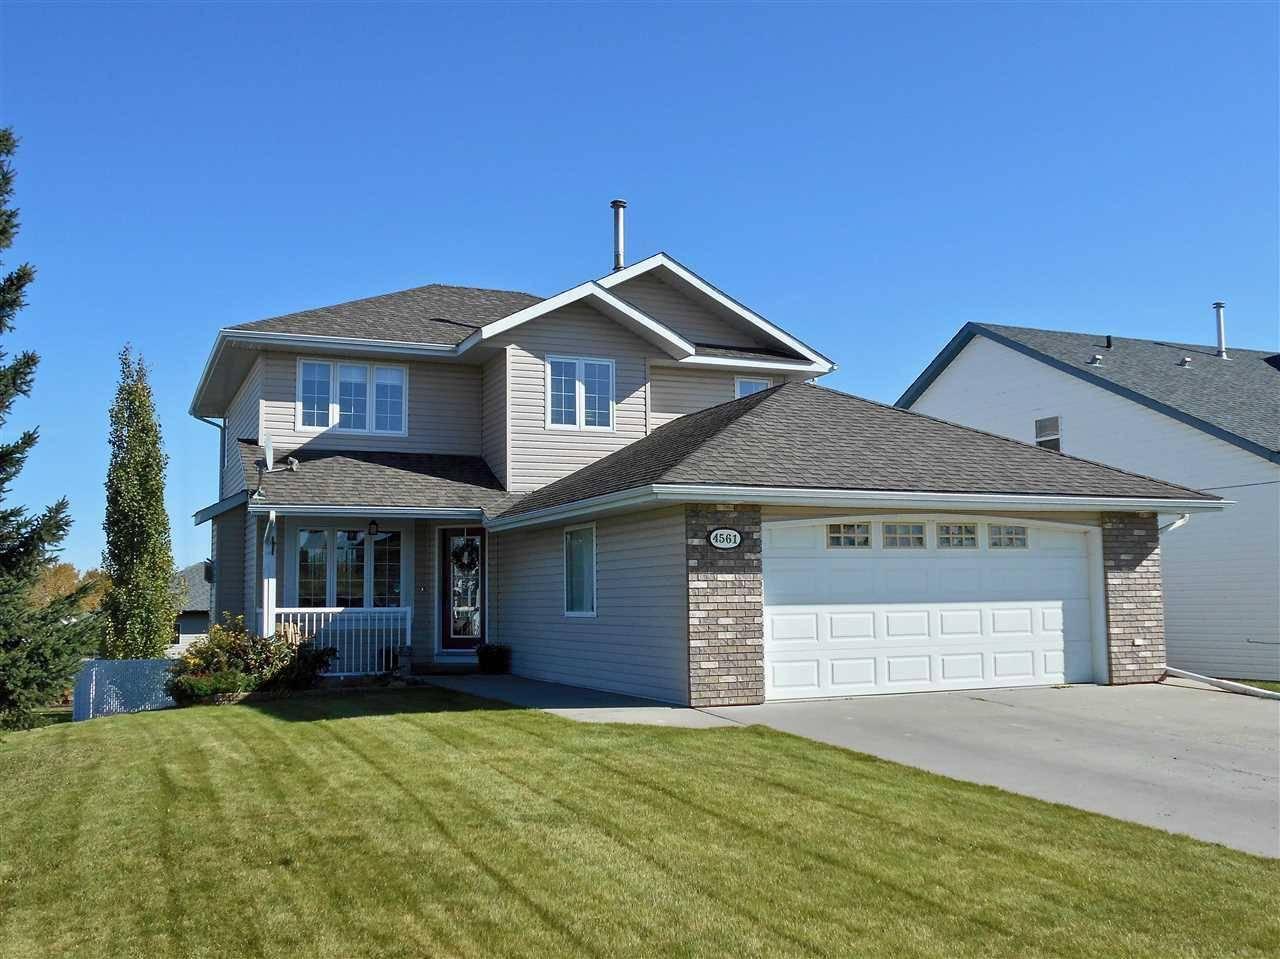 House for sale at 4561 Beckett Rd Drayton Valley Alberta - MLS: E4175610